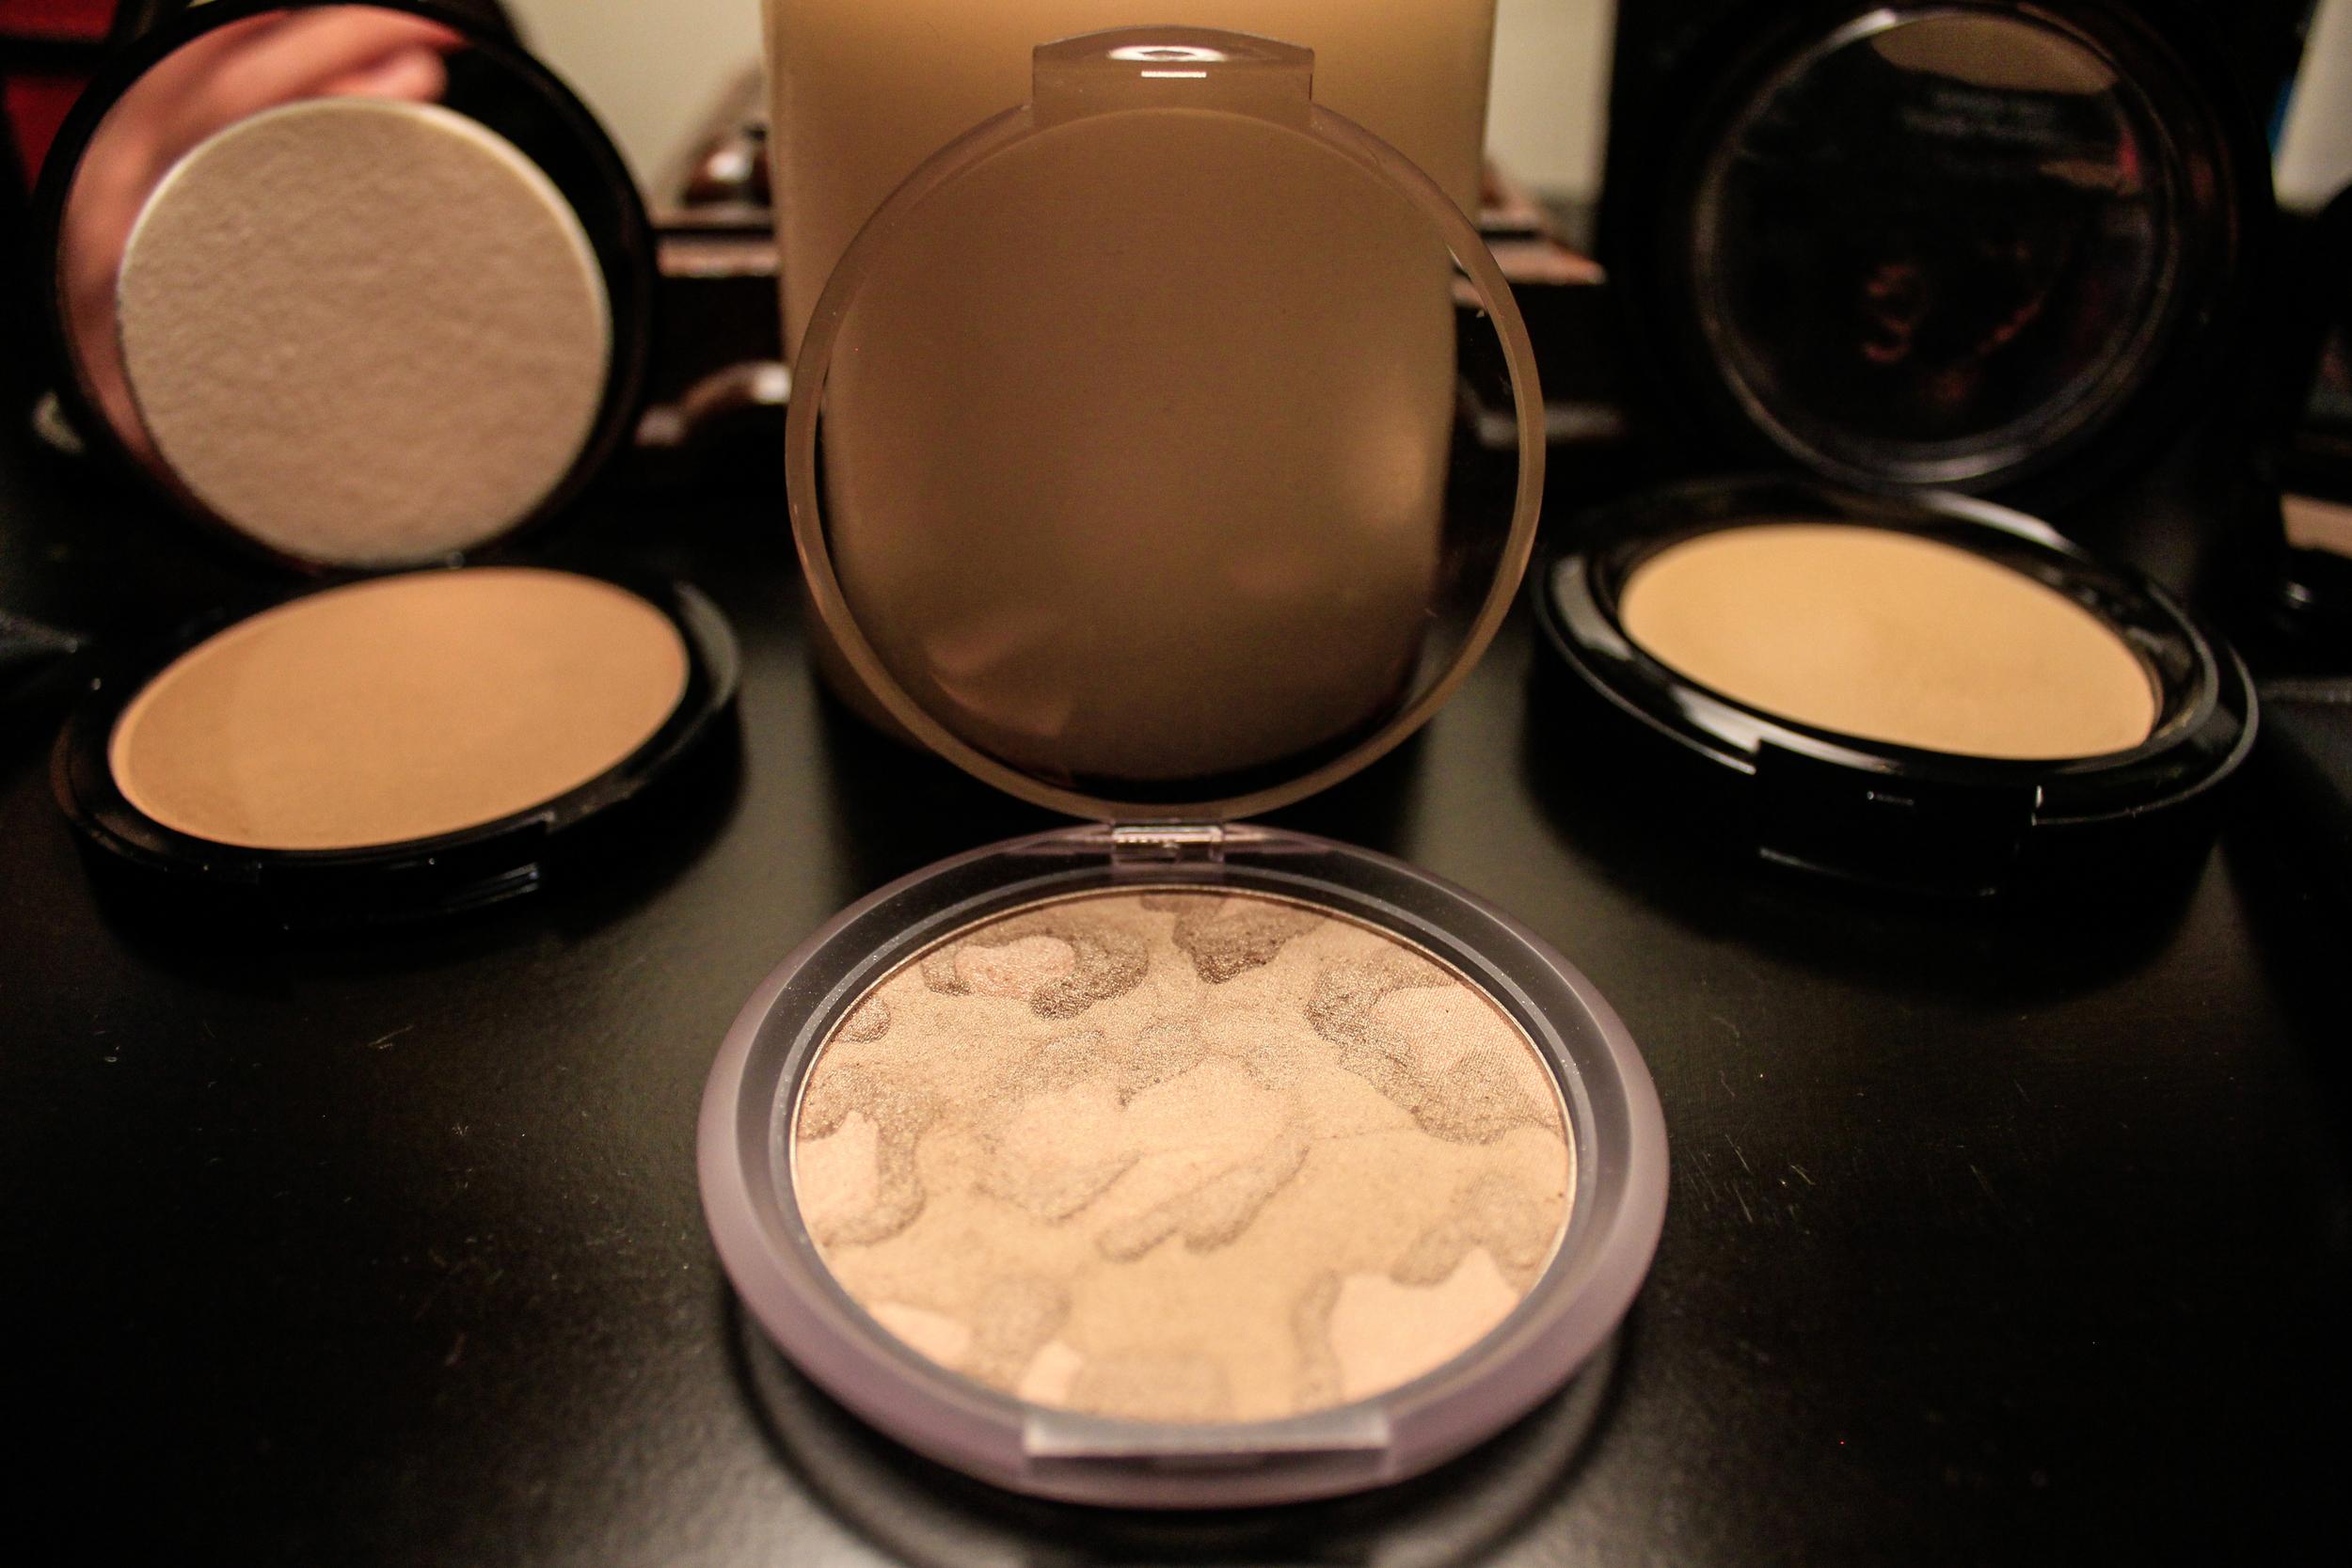 Copy of Baked bronzing powder $29